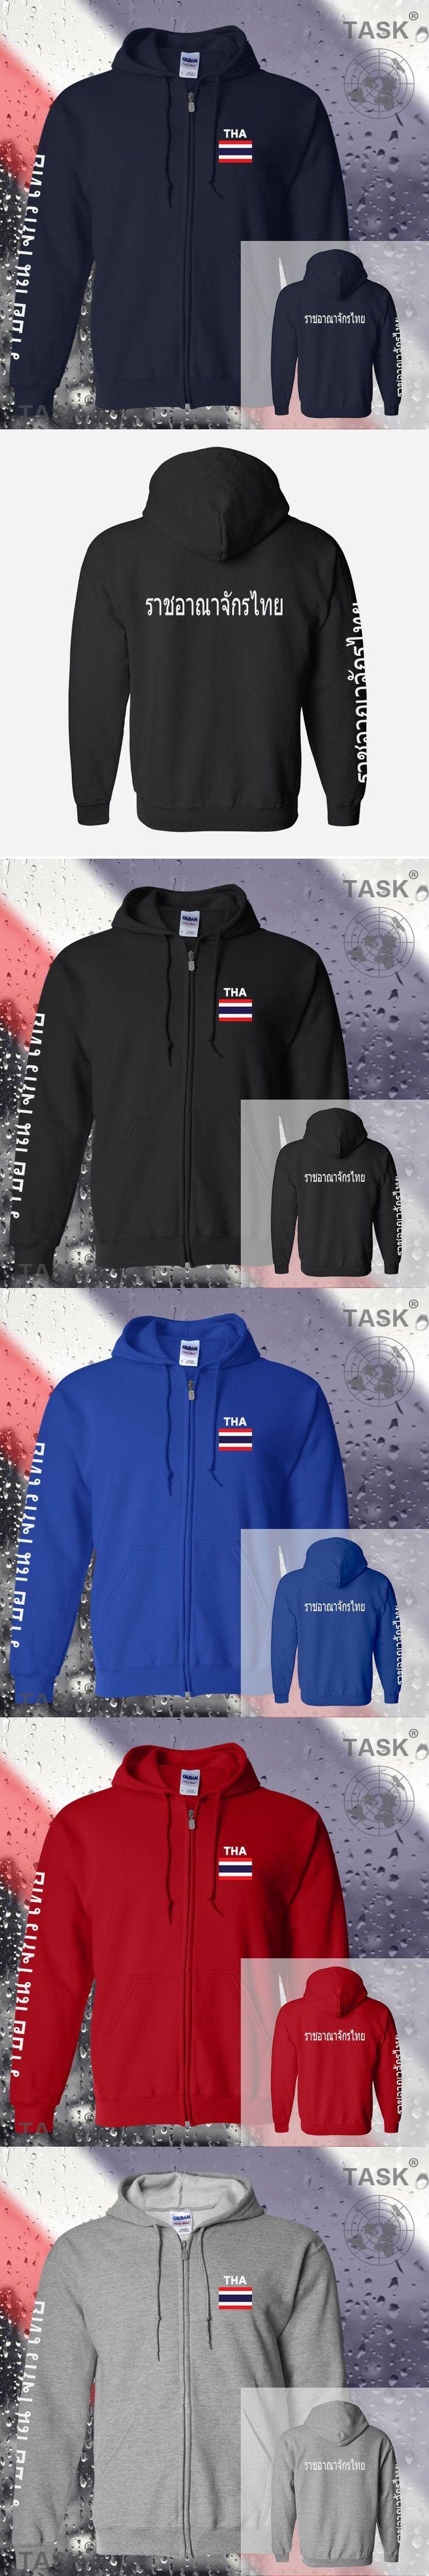 Thailand THA Thai Siamese mens hoodies and sweatshirt jerseys polo sweat new streetwear tracksuit nations fleece zipper flags